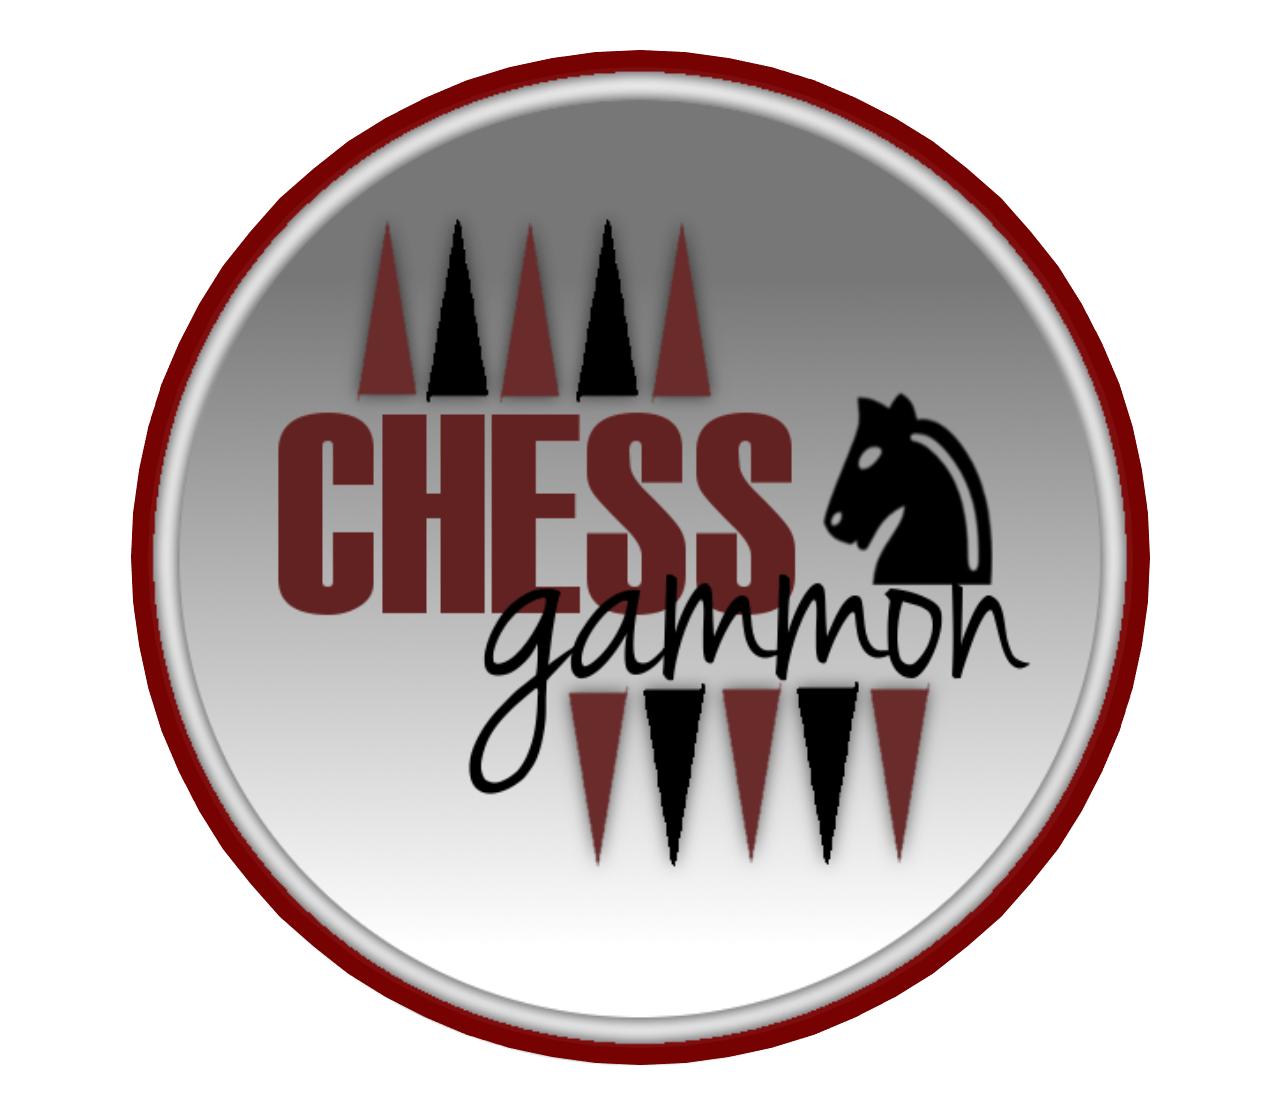 chess set and backgammon set